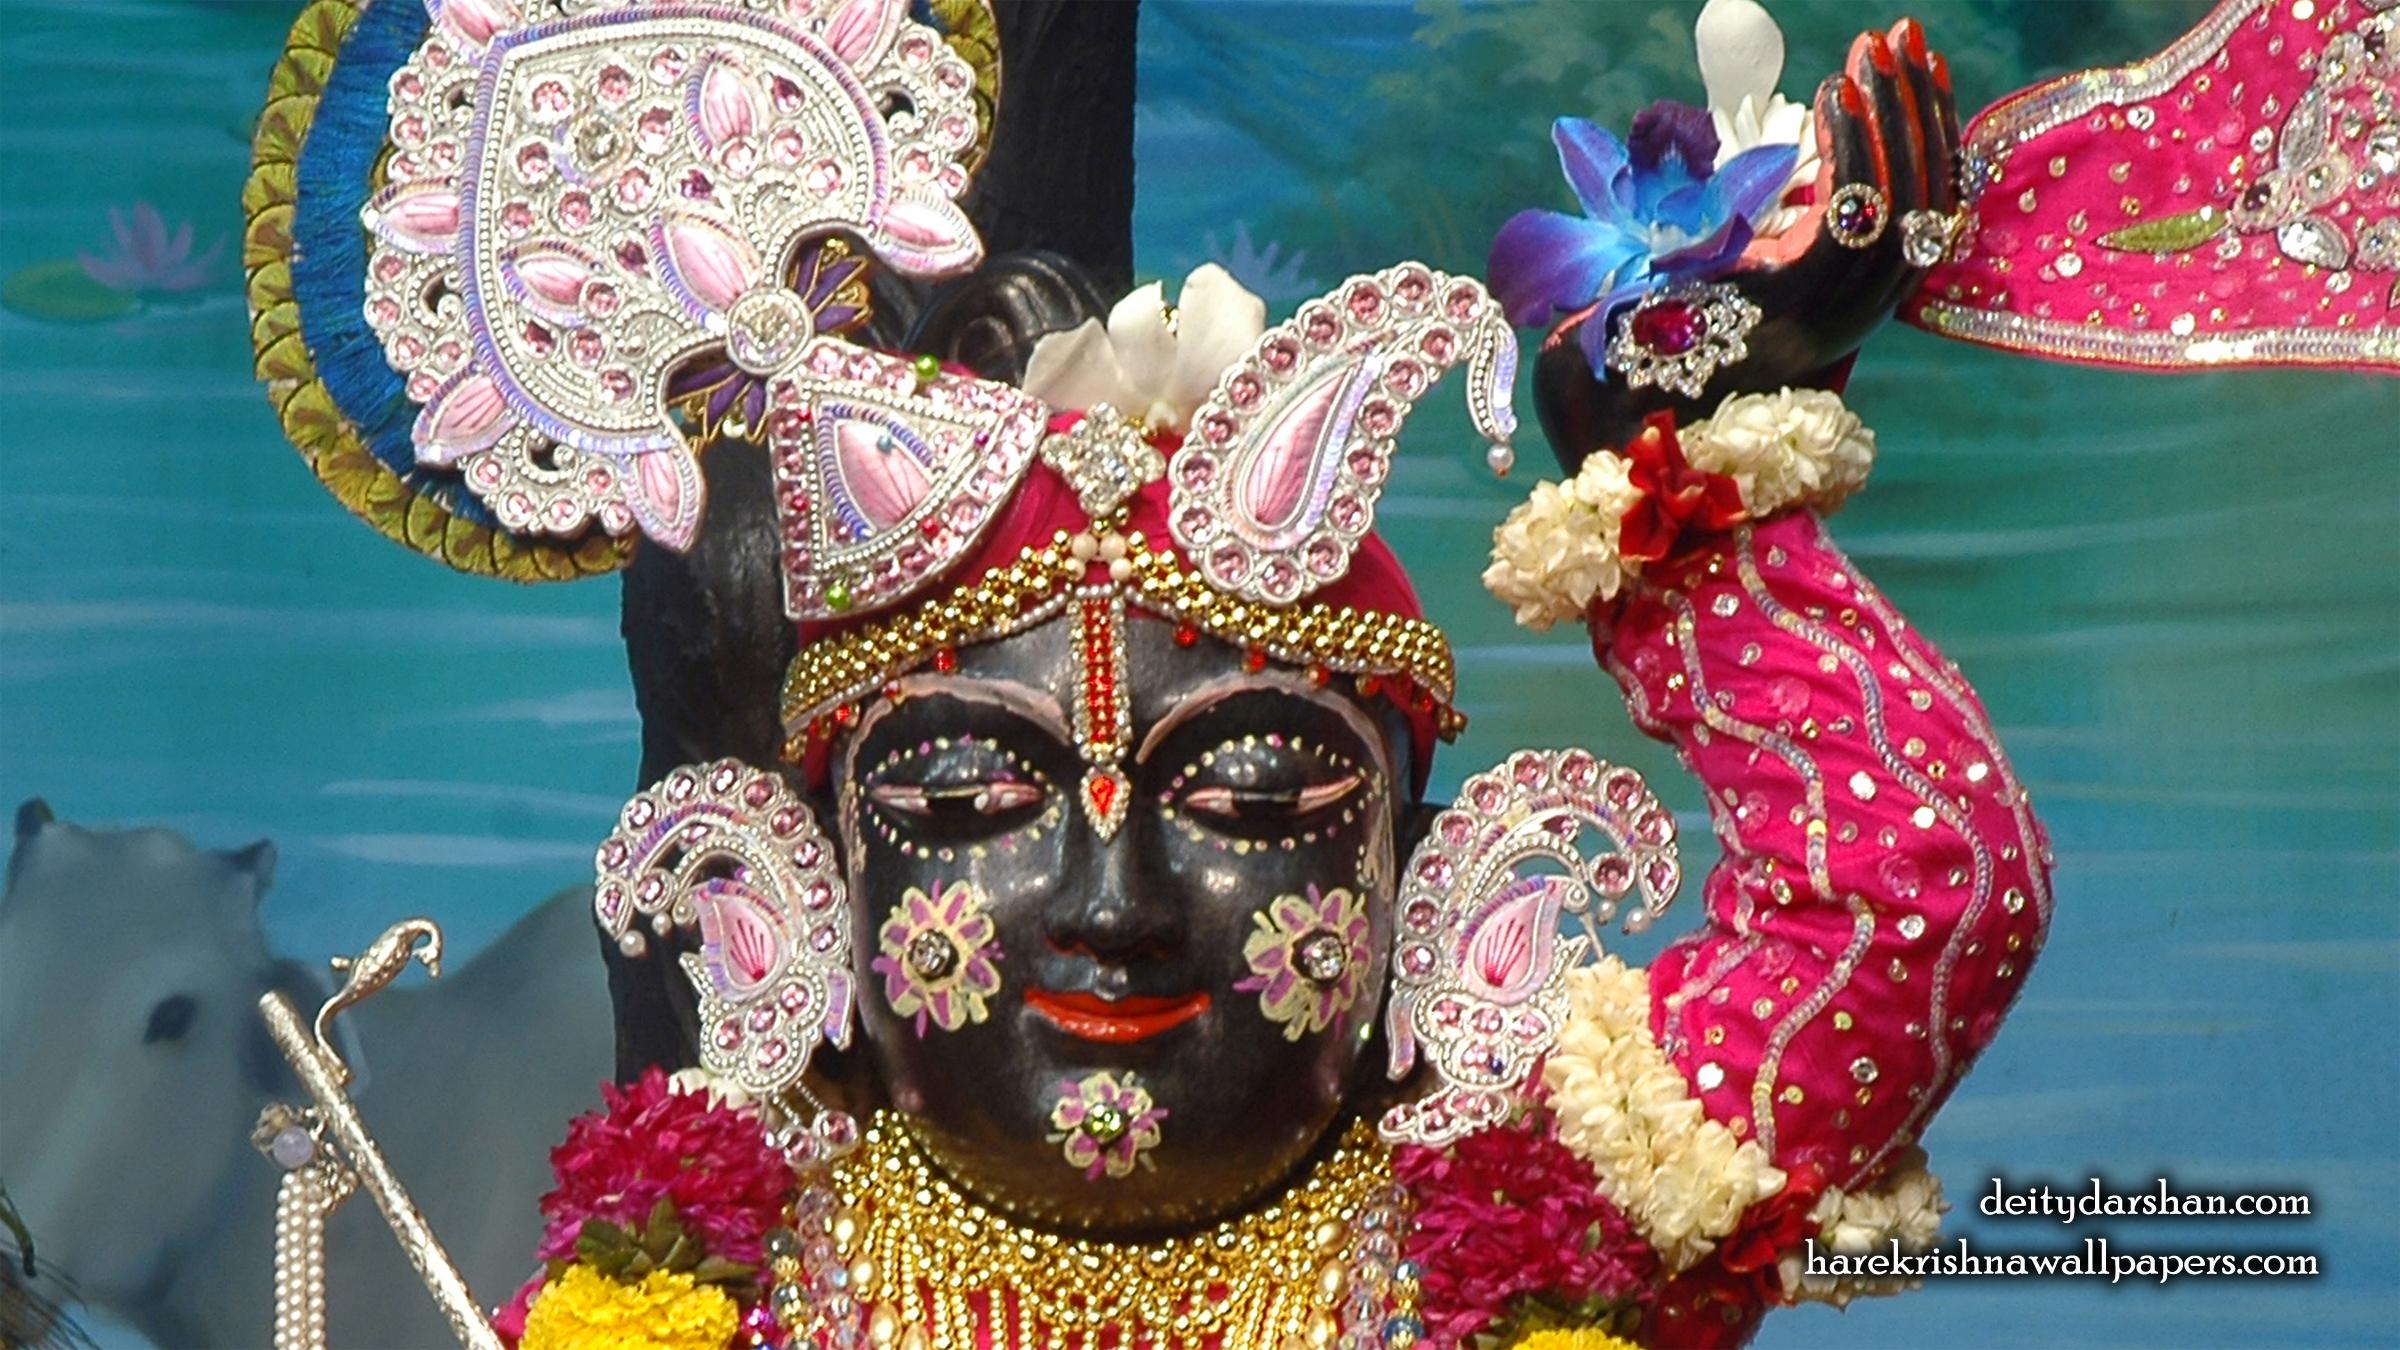 Sri Gopal Close up Wallpaper (050) Size 2400x1350 Download